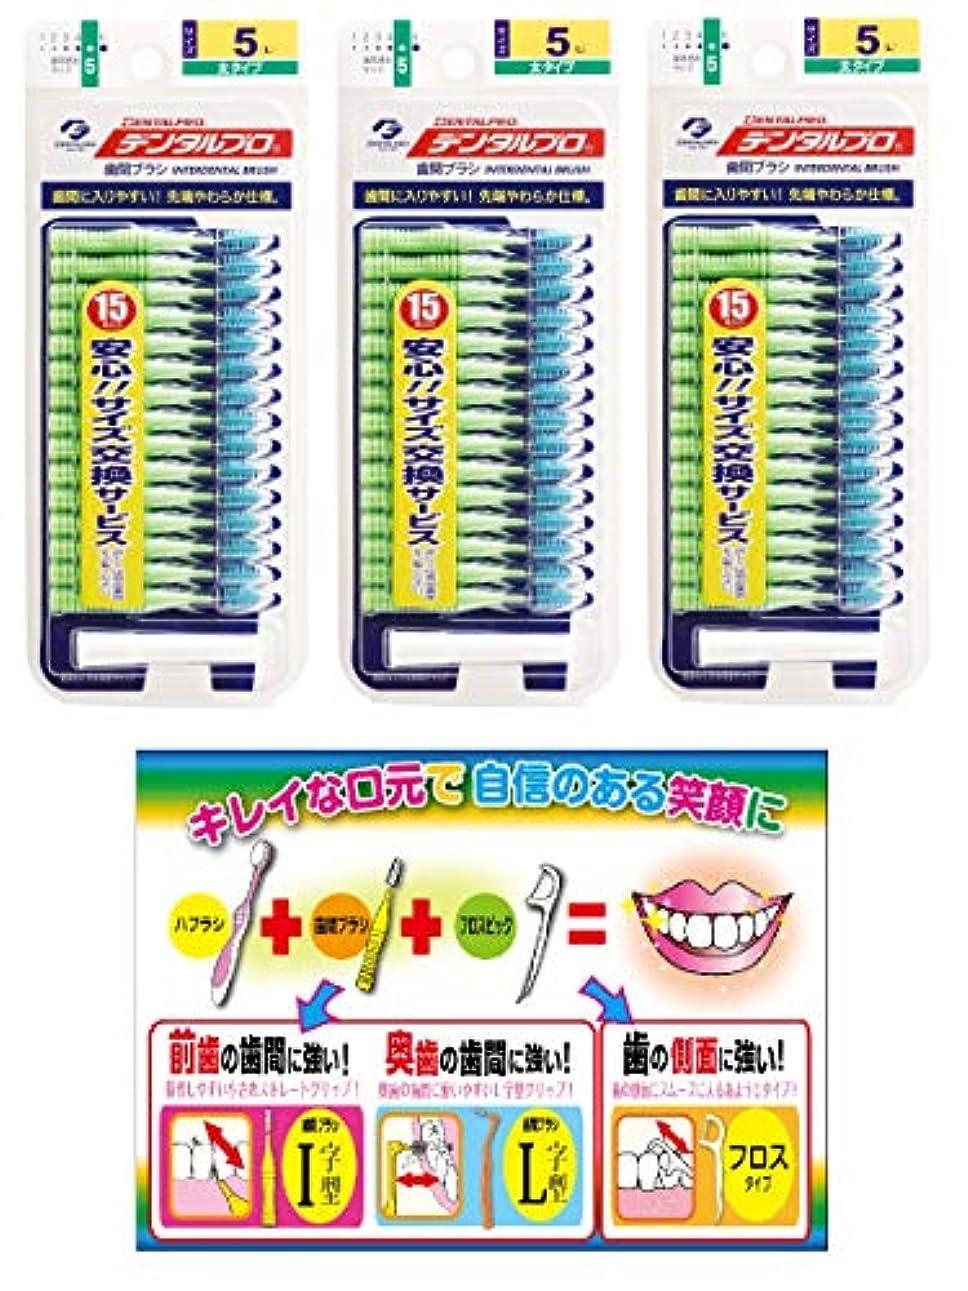 【Amazon.co.jp限定】DP歯間ブラシ15P サイズ5 3P+リーフレット